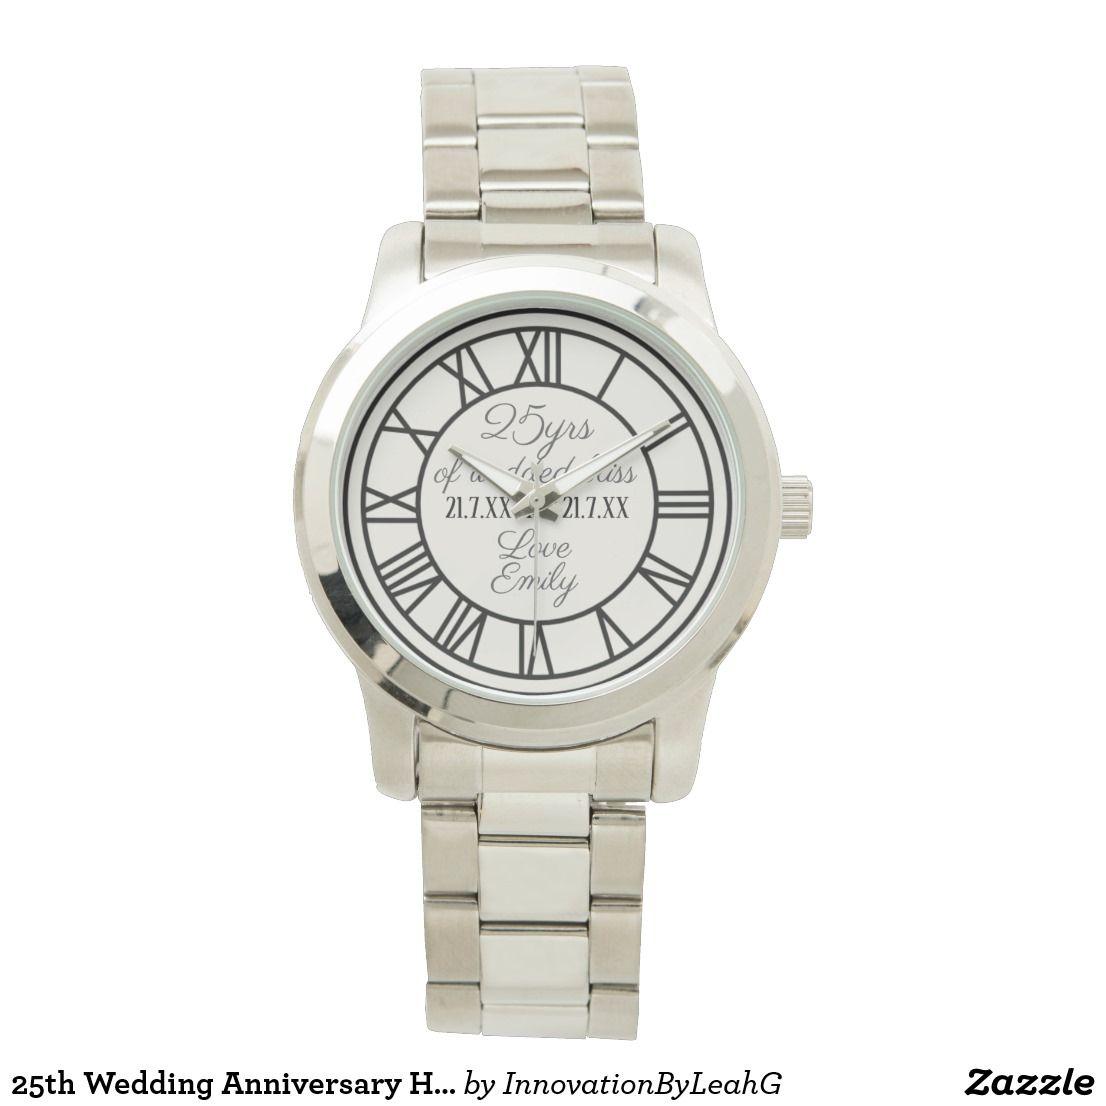 25th Wedding Anniversary Husband Roman Numerals Wrist Watch